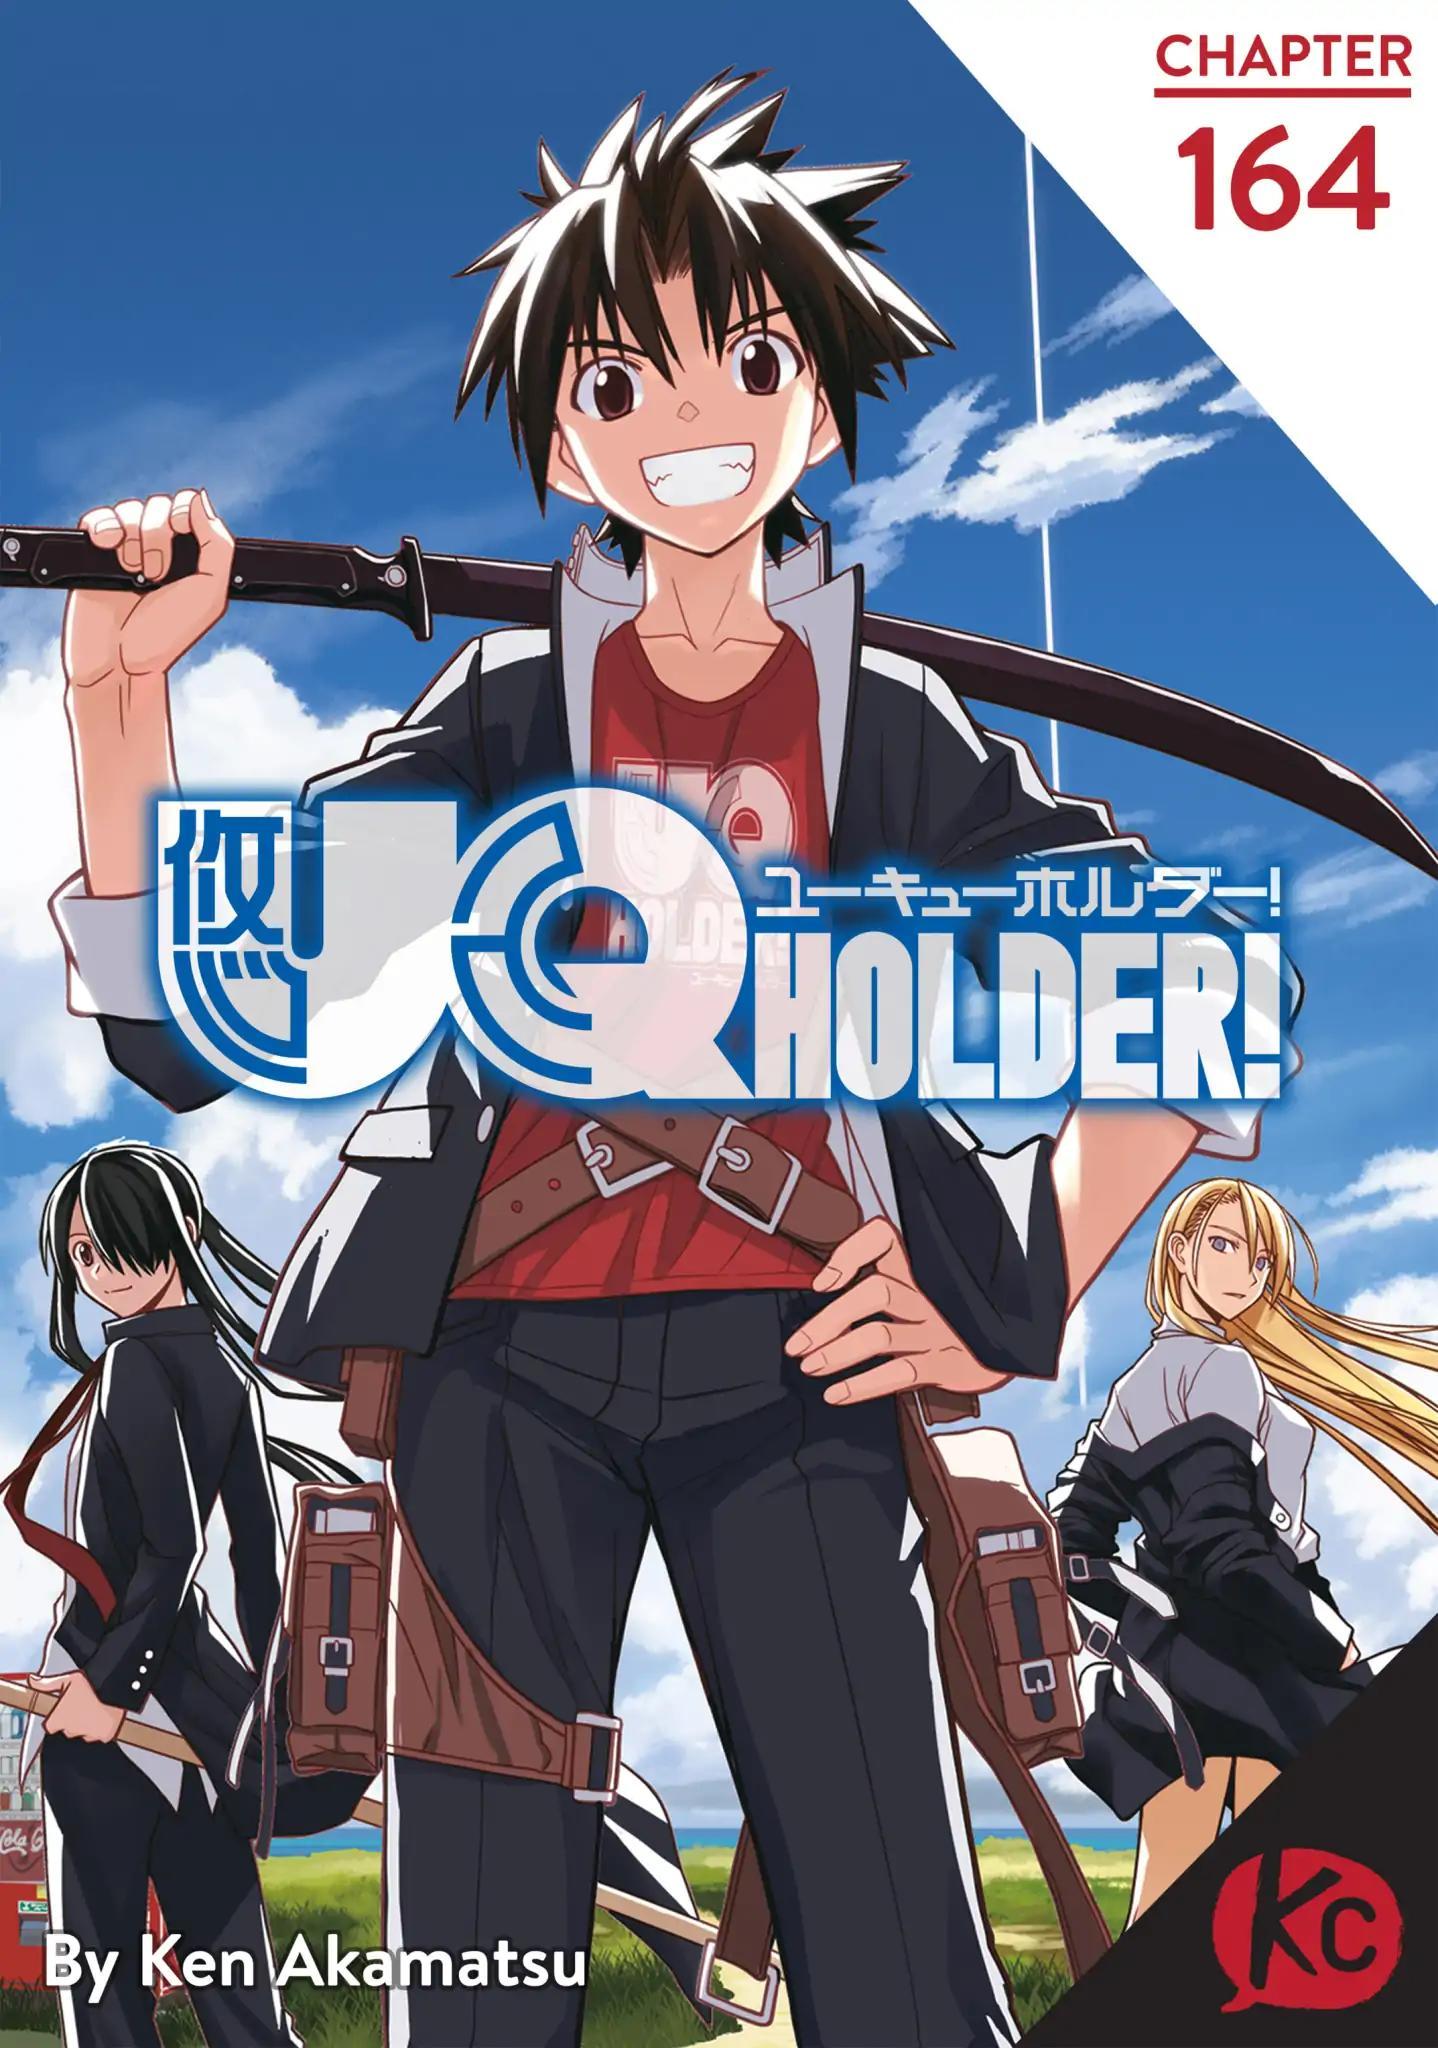 https://manga.mangadogs.com/comics/pic2/32/224/886740/711f847d33812ecfe772d196a83d5c6a.jpg Page 1